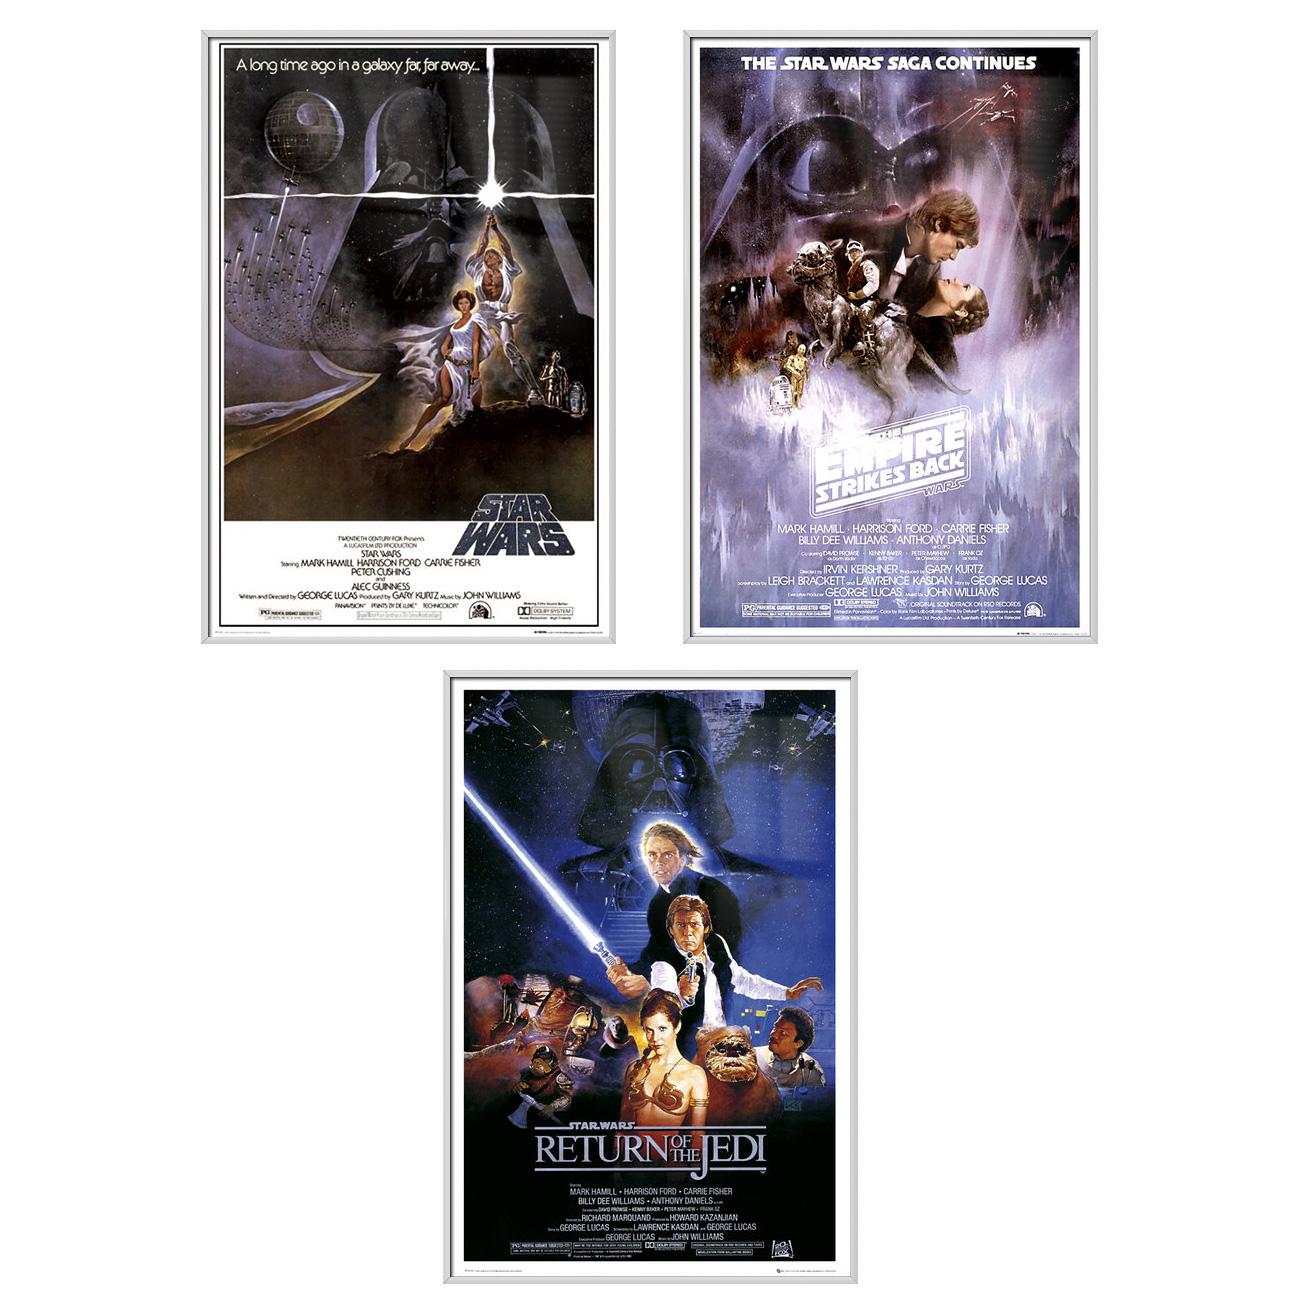 "Star Wars Episode IV, V & VI - 3 Piece Movie Poster / Print Set (3 Regular Style Posters - Version 1) (Size: 24"" x 36"" each)"